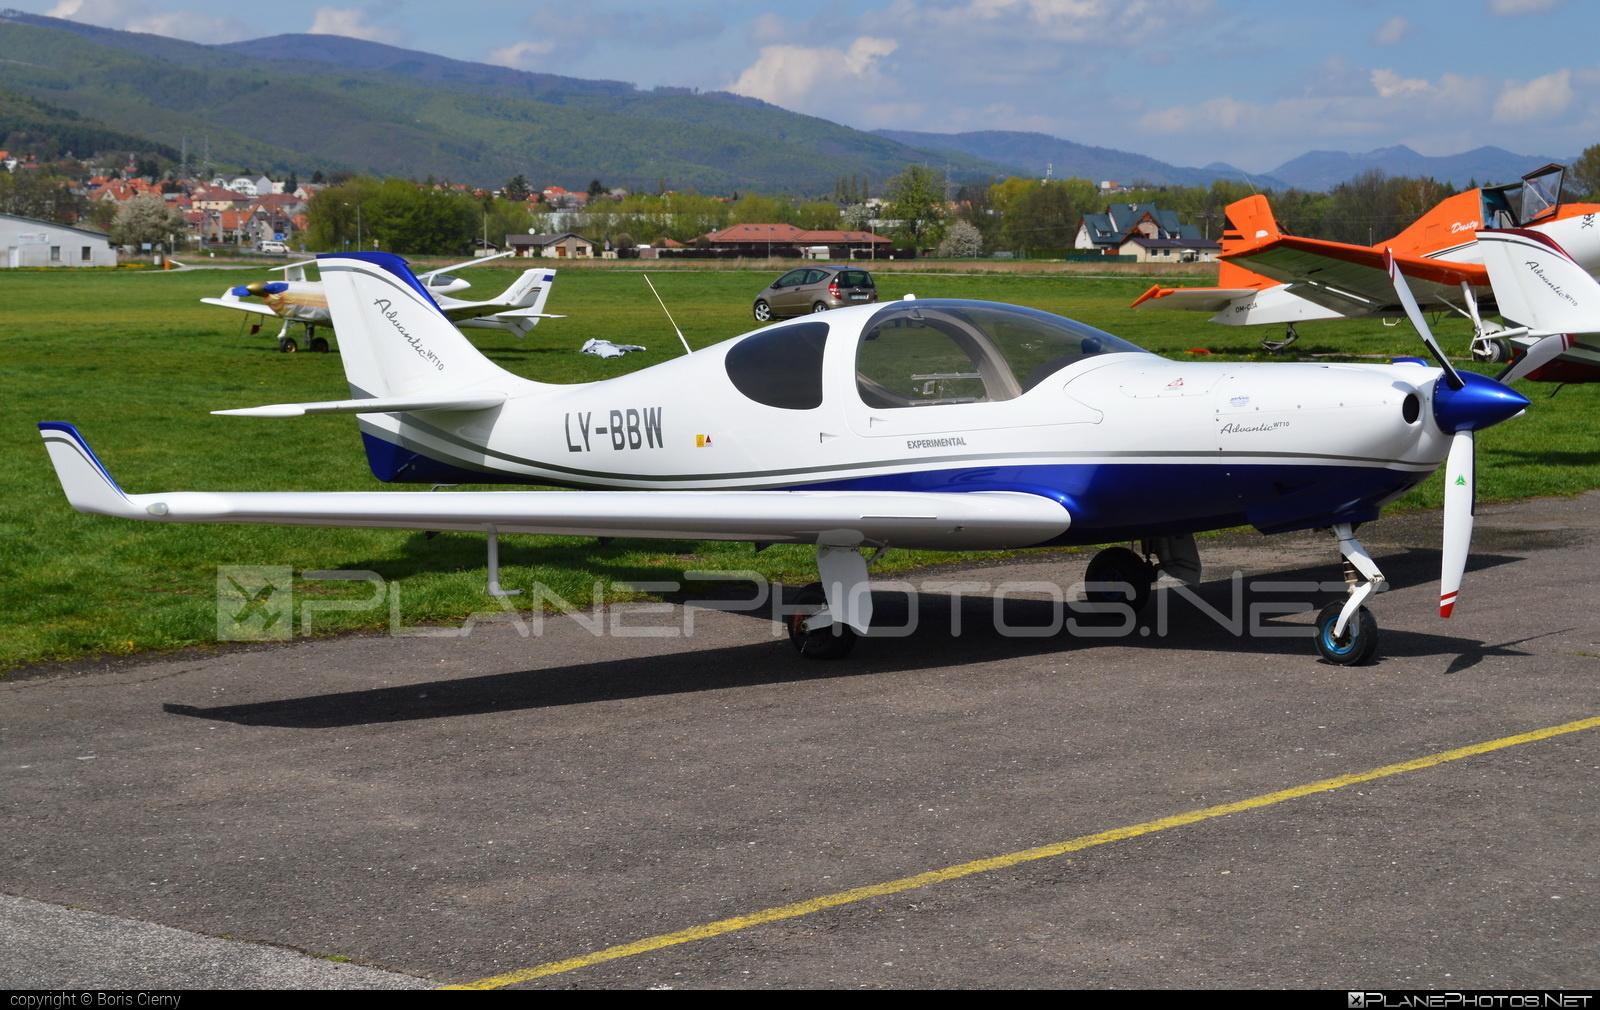 Aerospool WT10 Advantic - LY-BBW operated by Private operator #aerospool